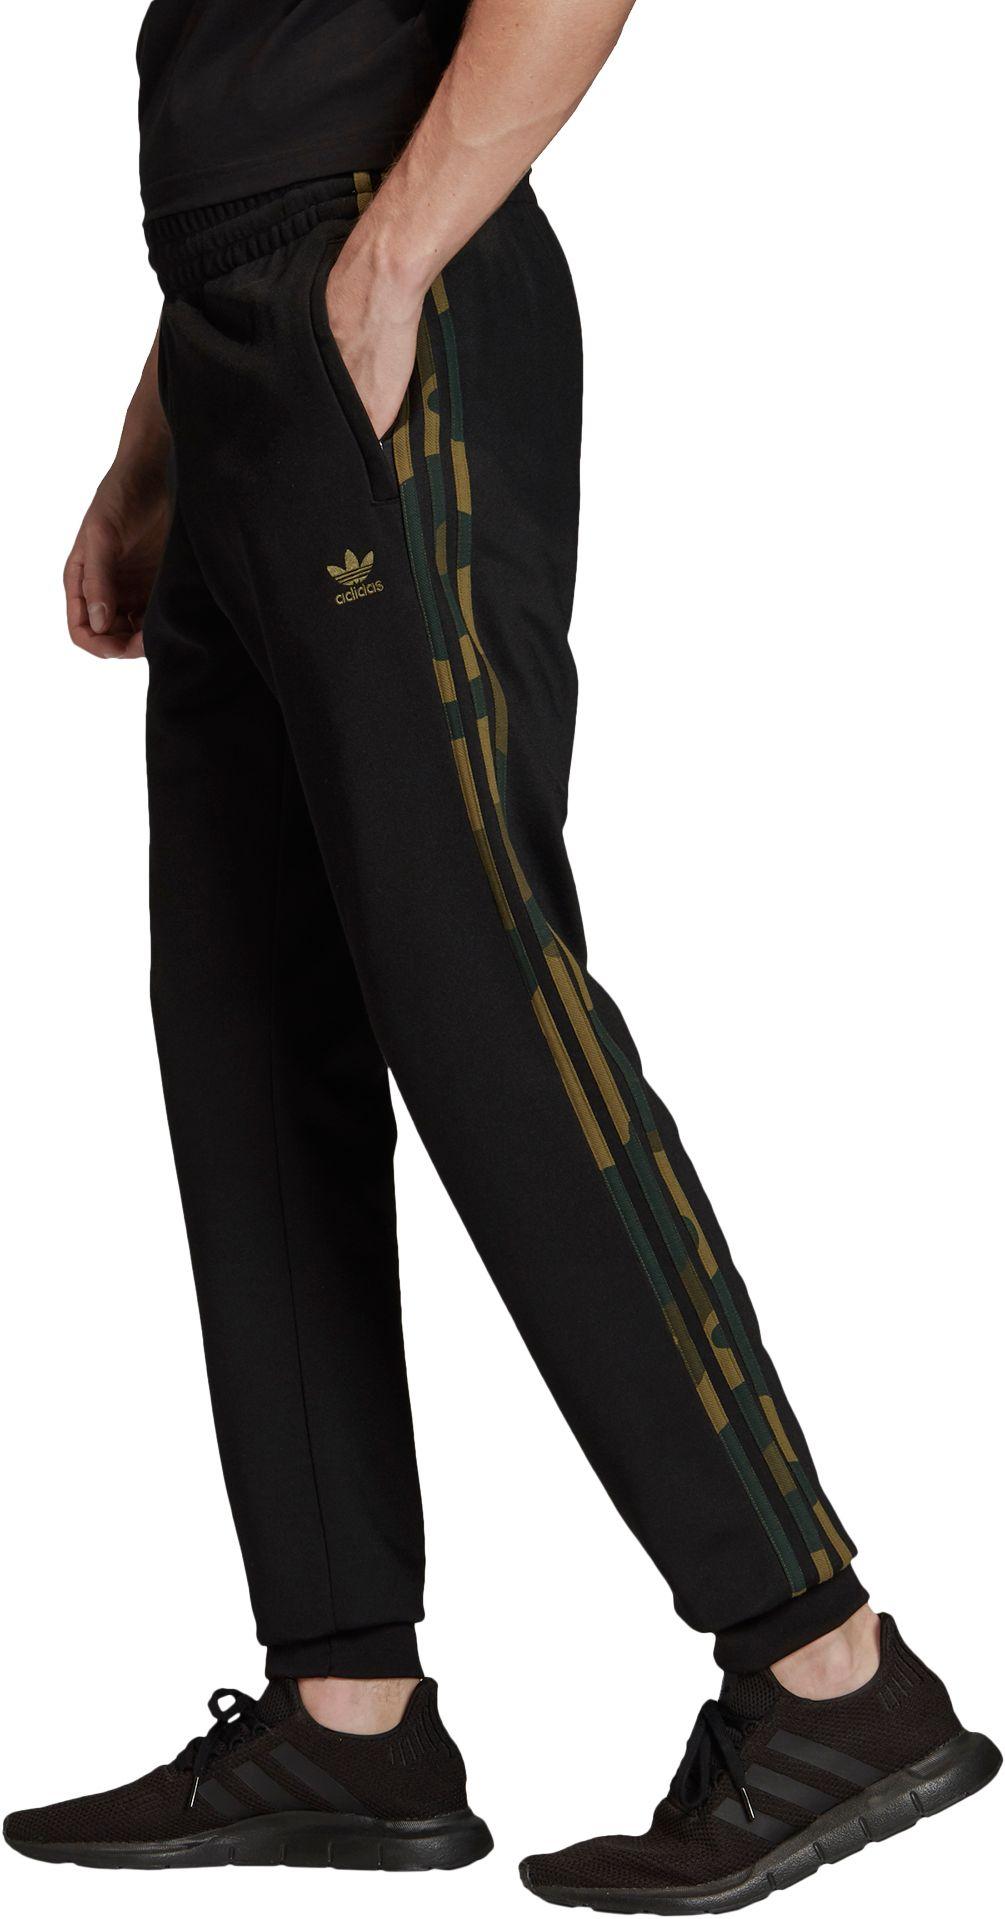 adidas Originals Men's Camouflage Track Pants, Size: Small, Black thumbnail